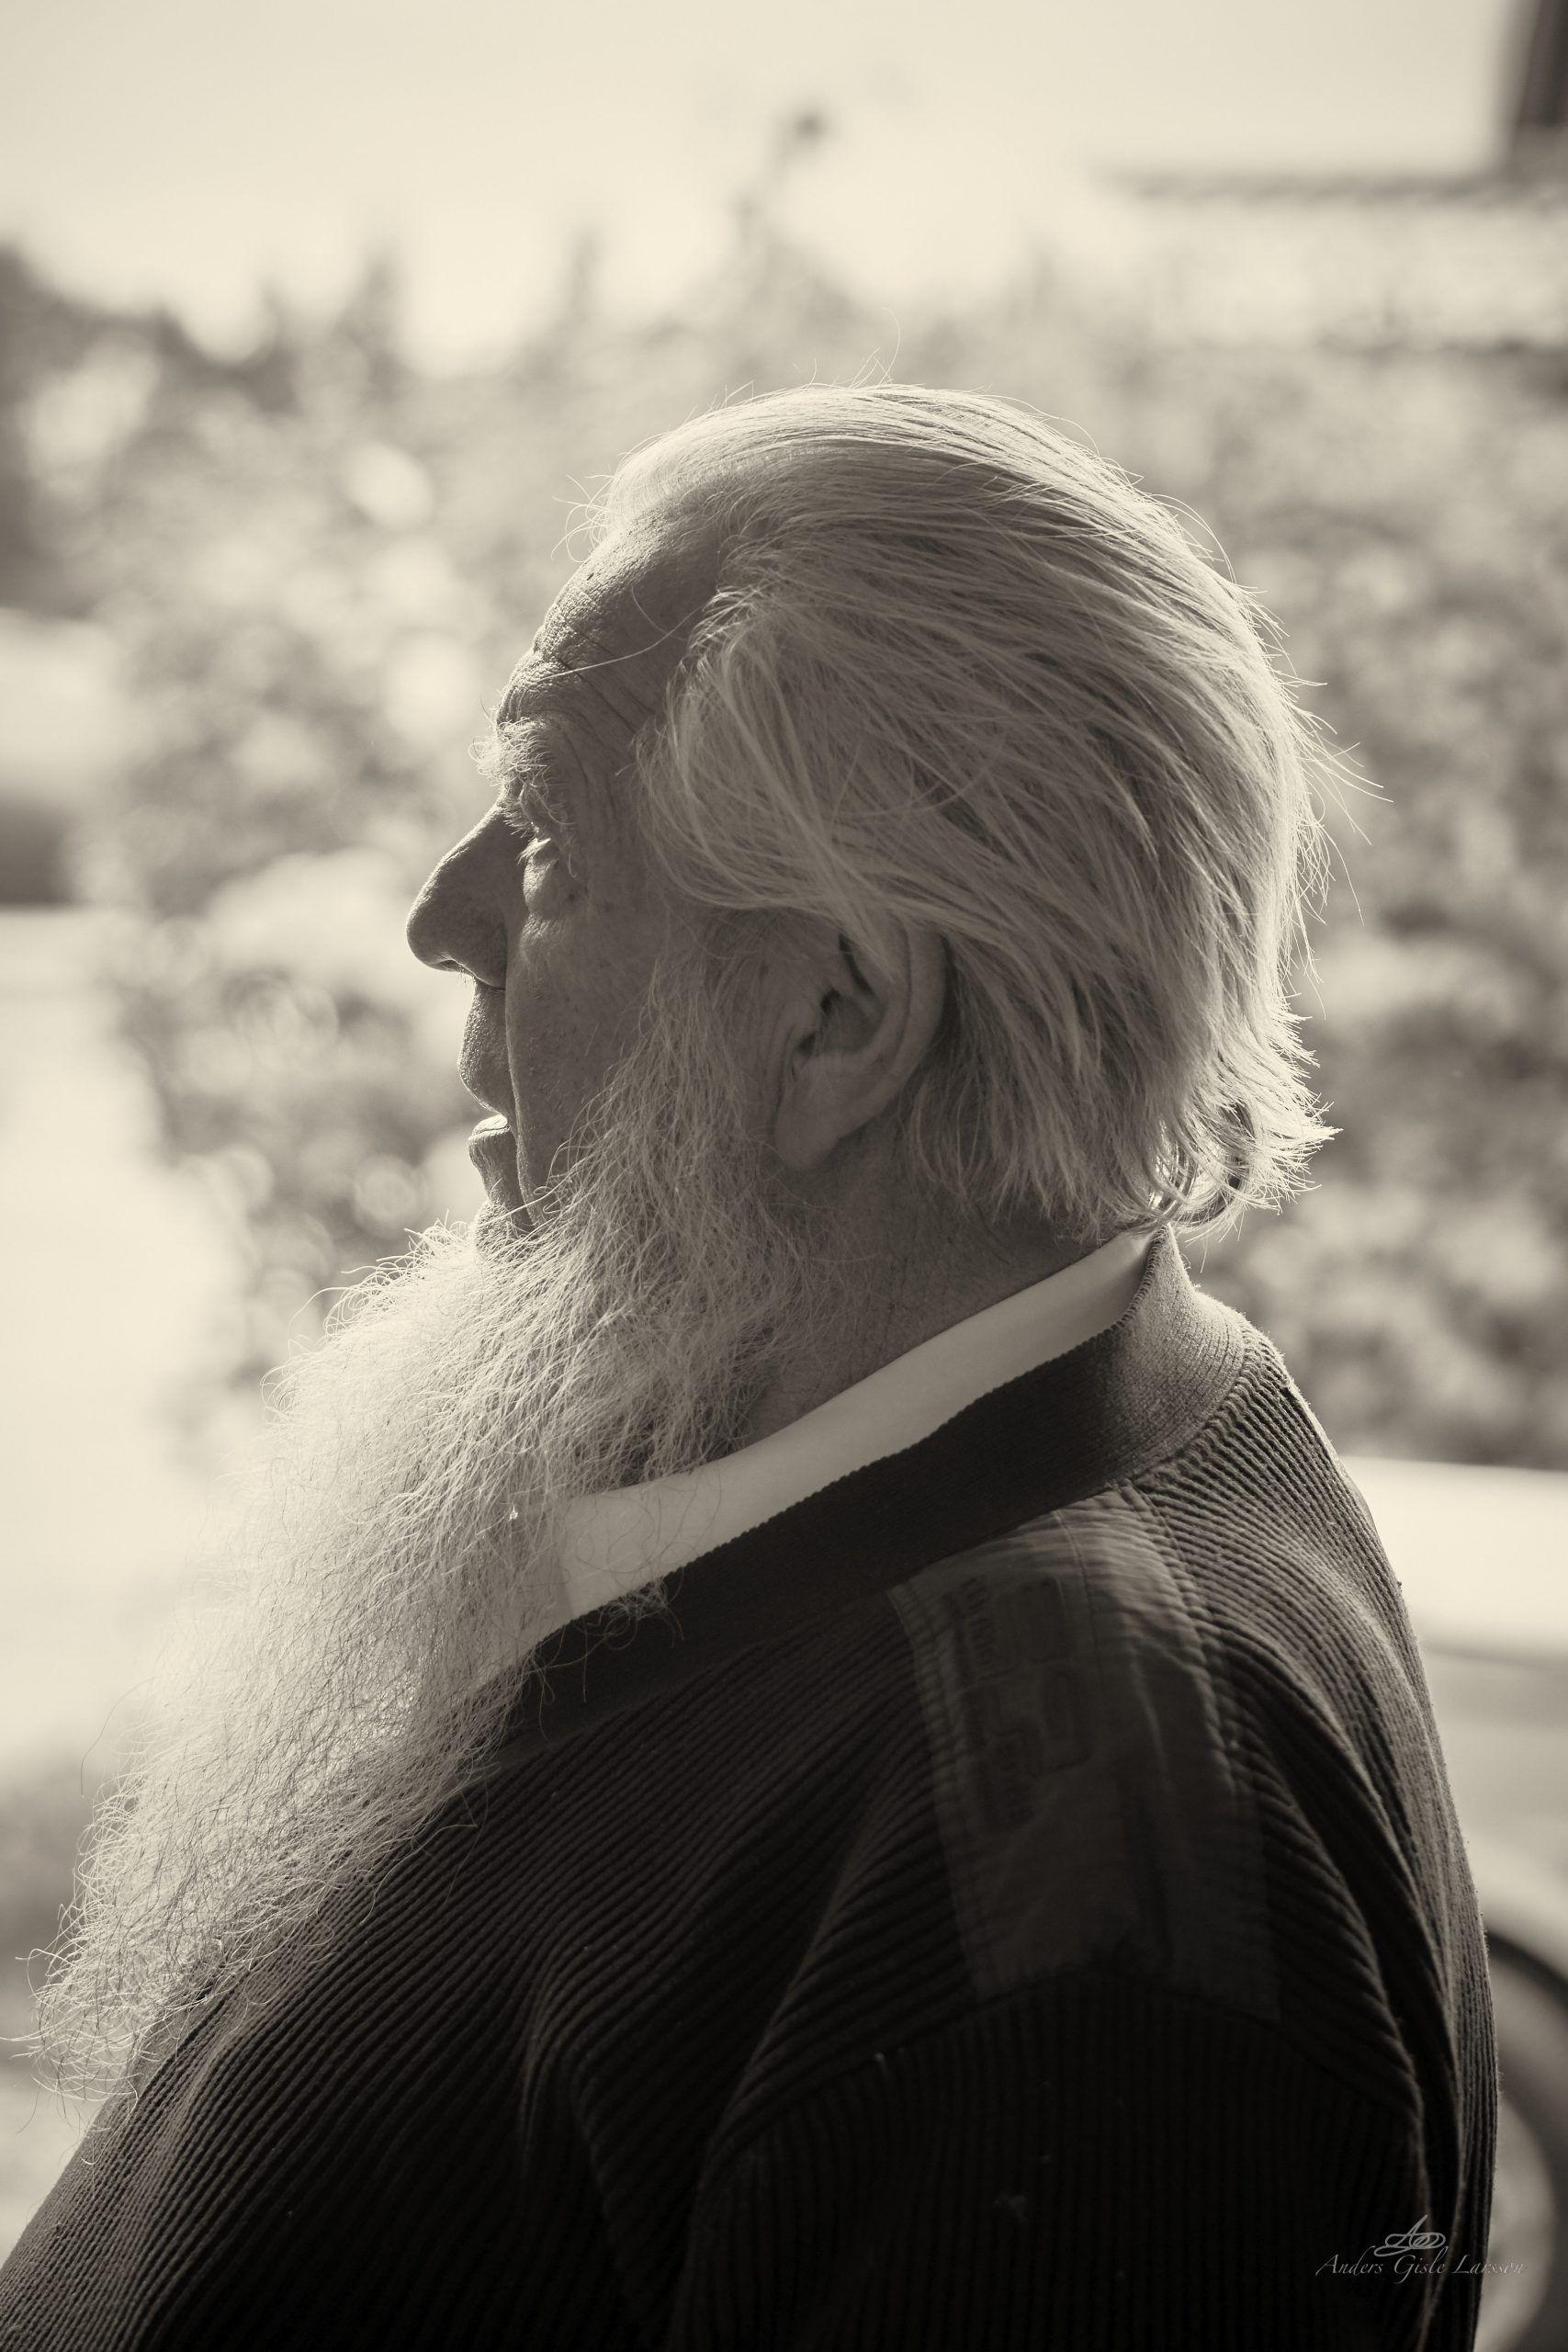 48/365, Rimsø præsten, Kurth Storm Norin Carlsson